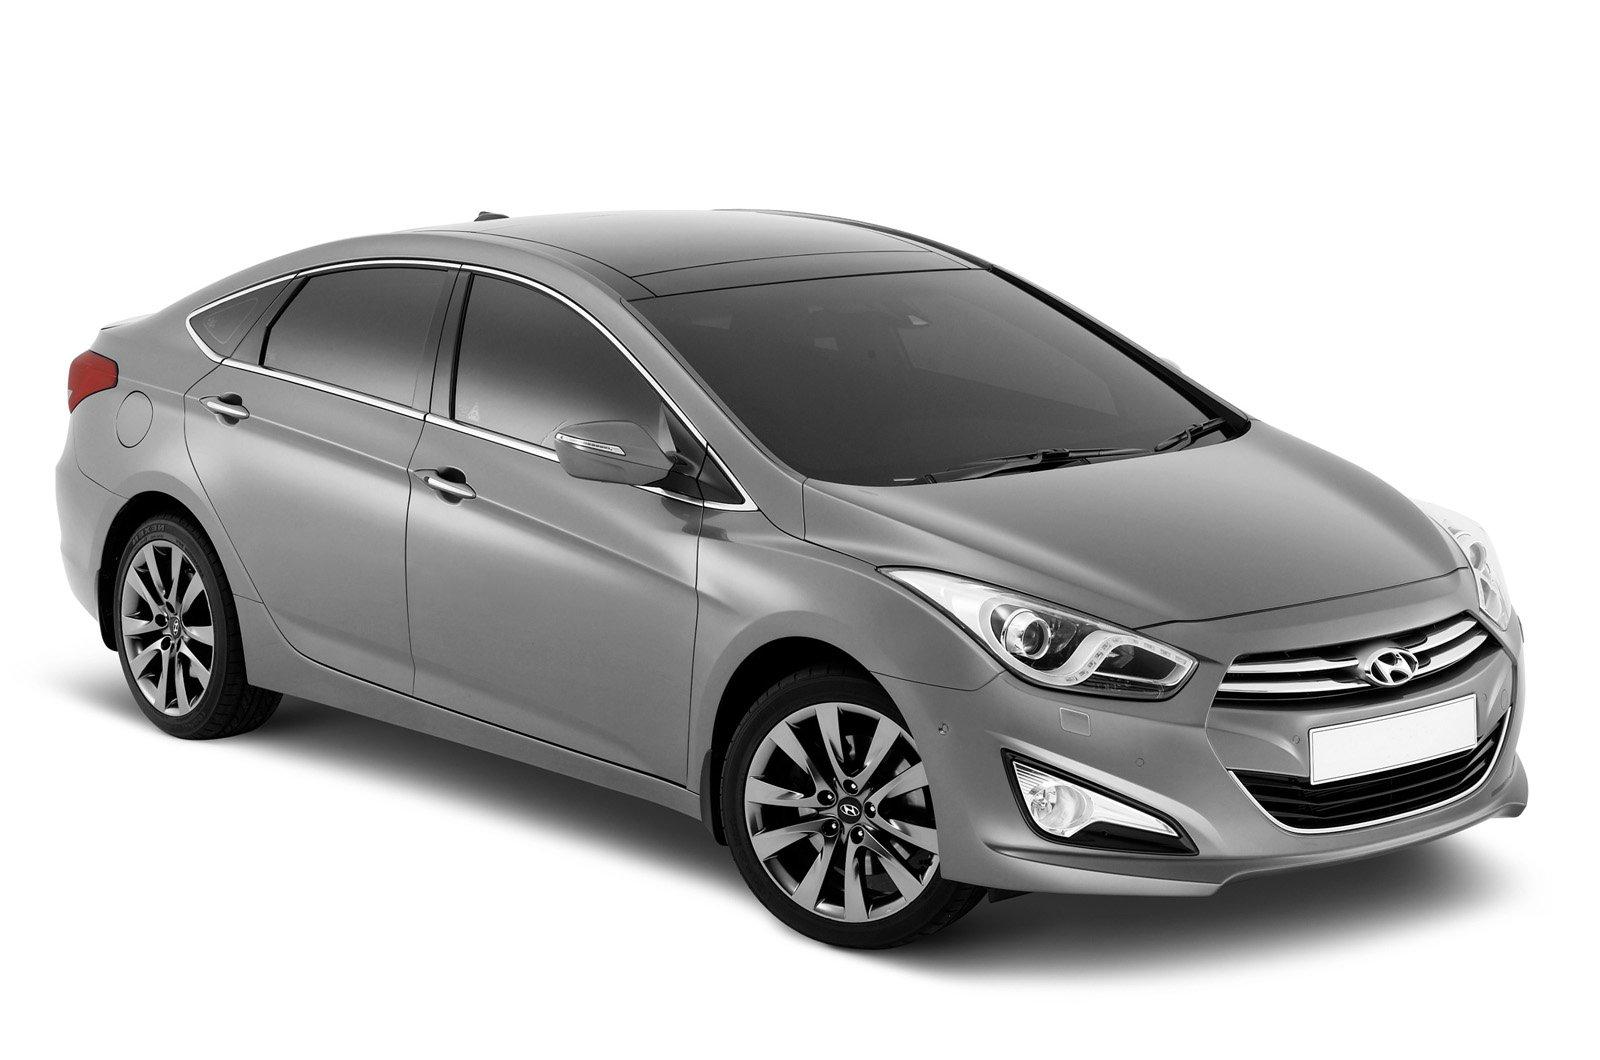 Hyundai i40 saloon studio front